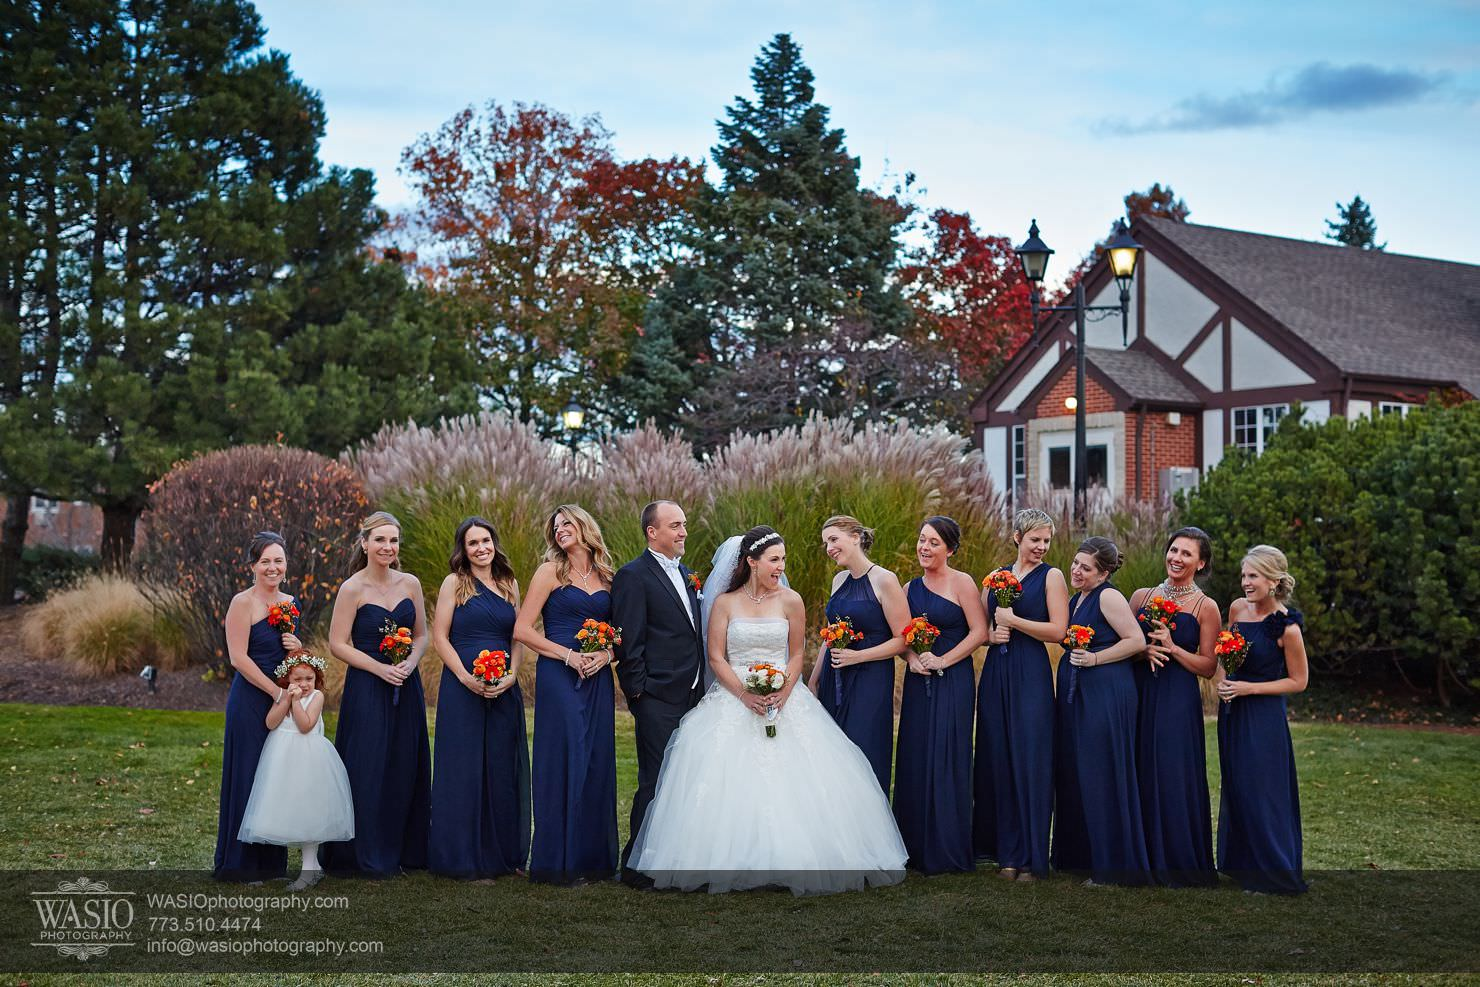 Rosemont-Fall-Wedding-Lauren-and-David-023 Rosemont Fall Wedding - Lauren + David